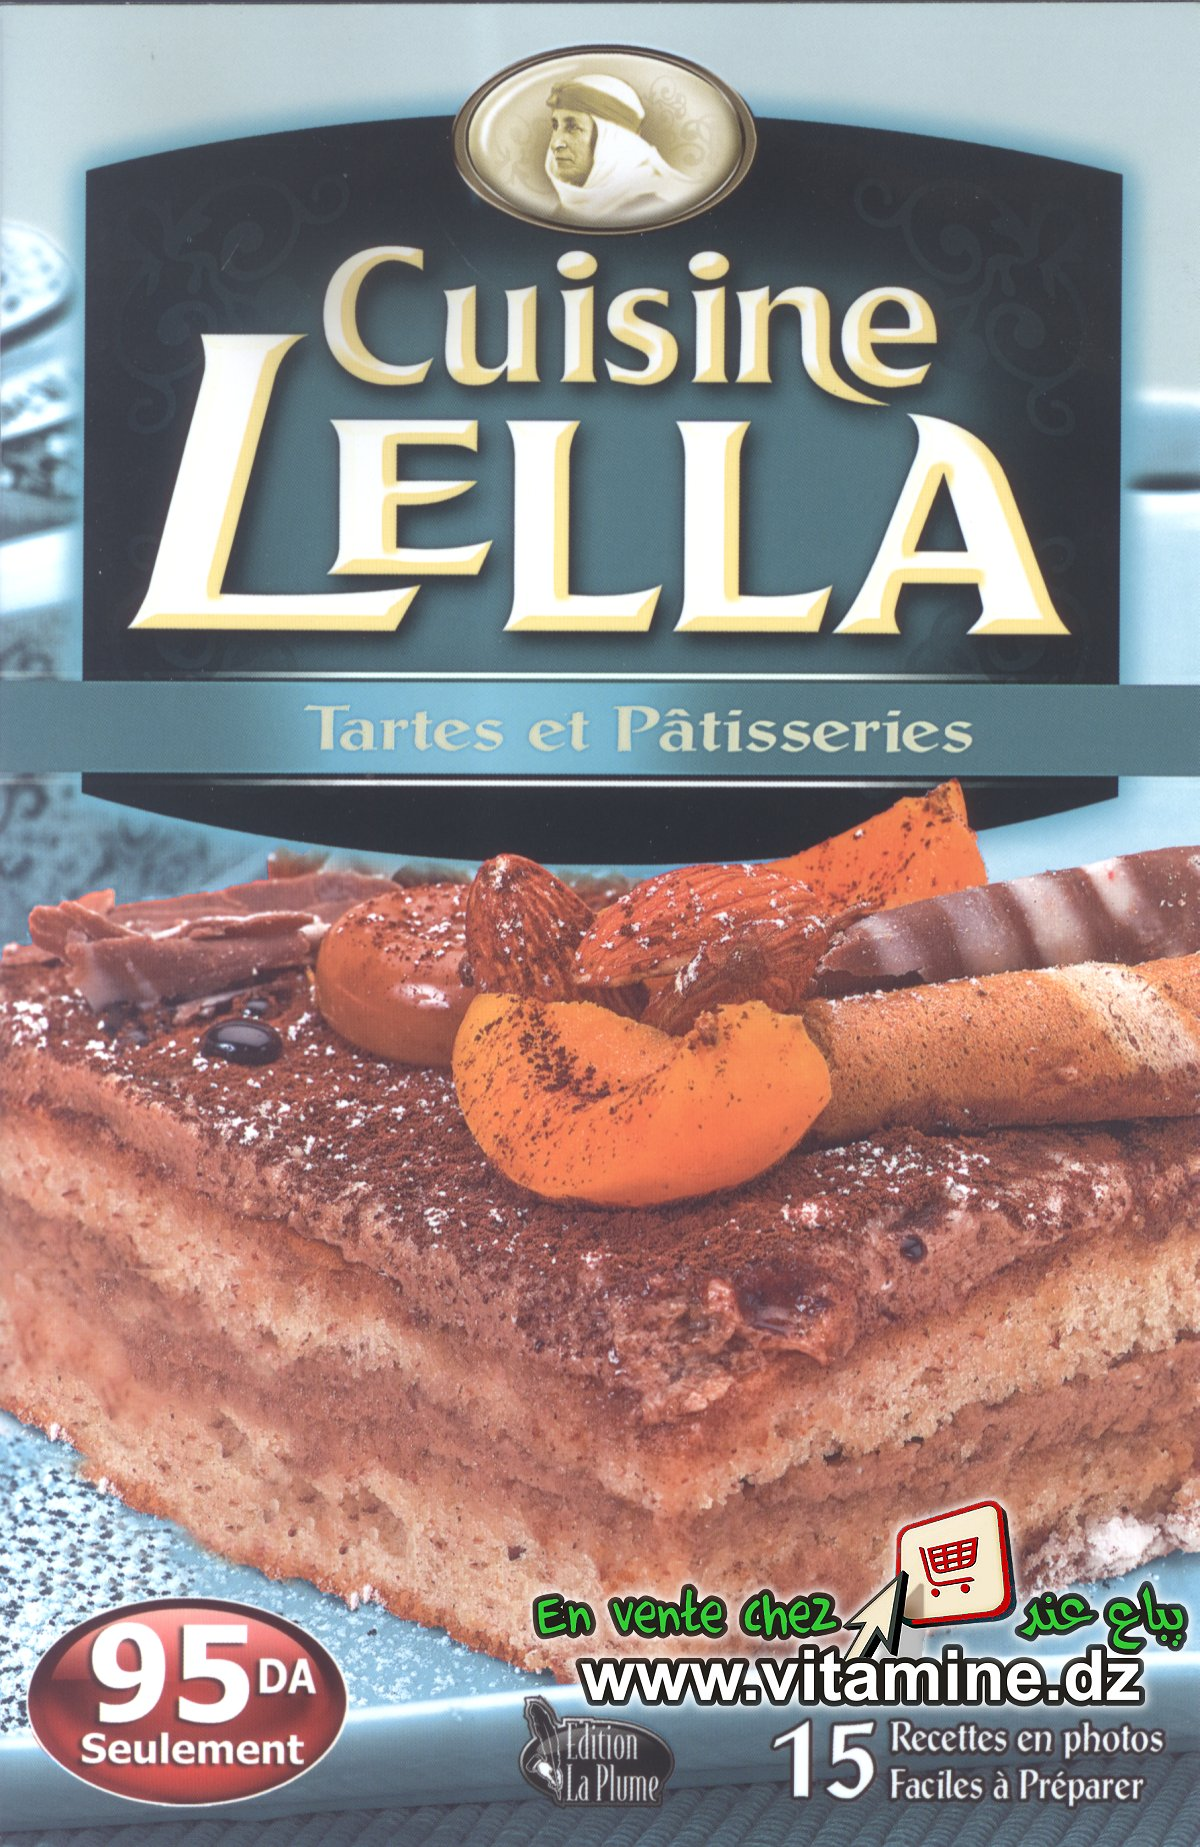 Cuisine Lella - Tartes et pâtisseries